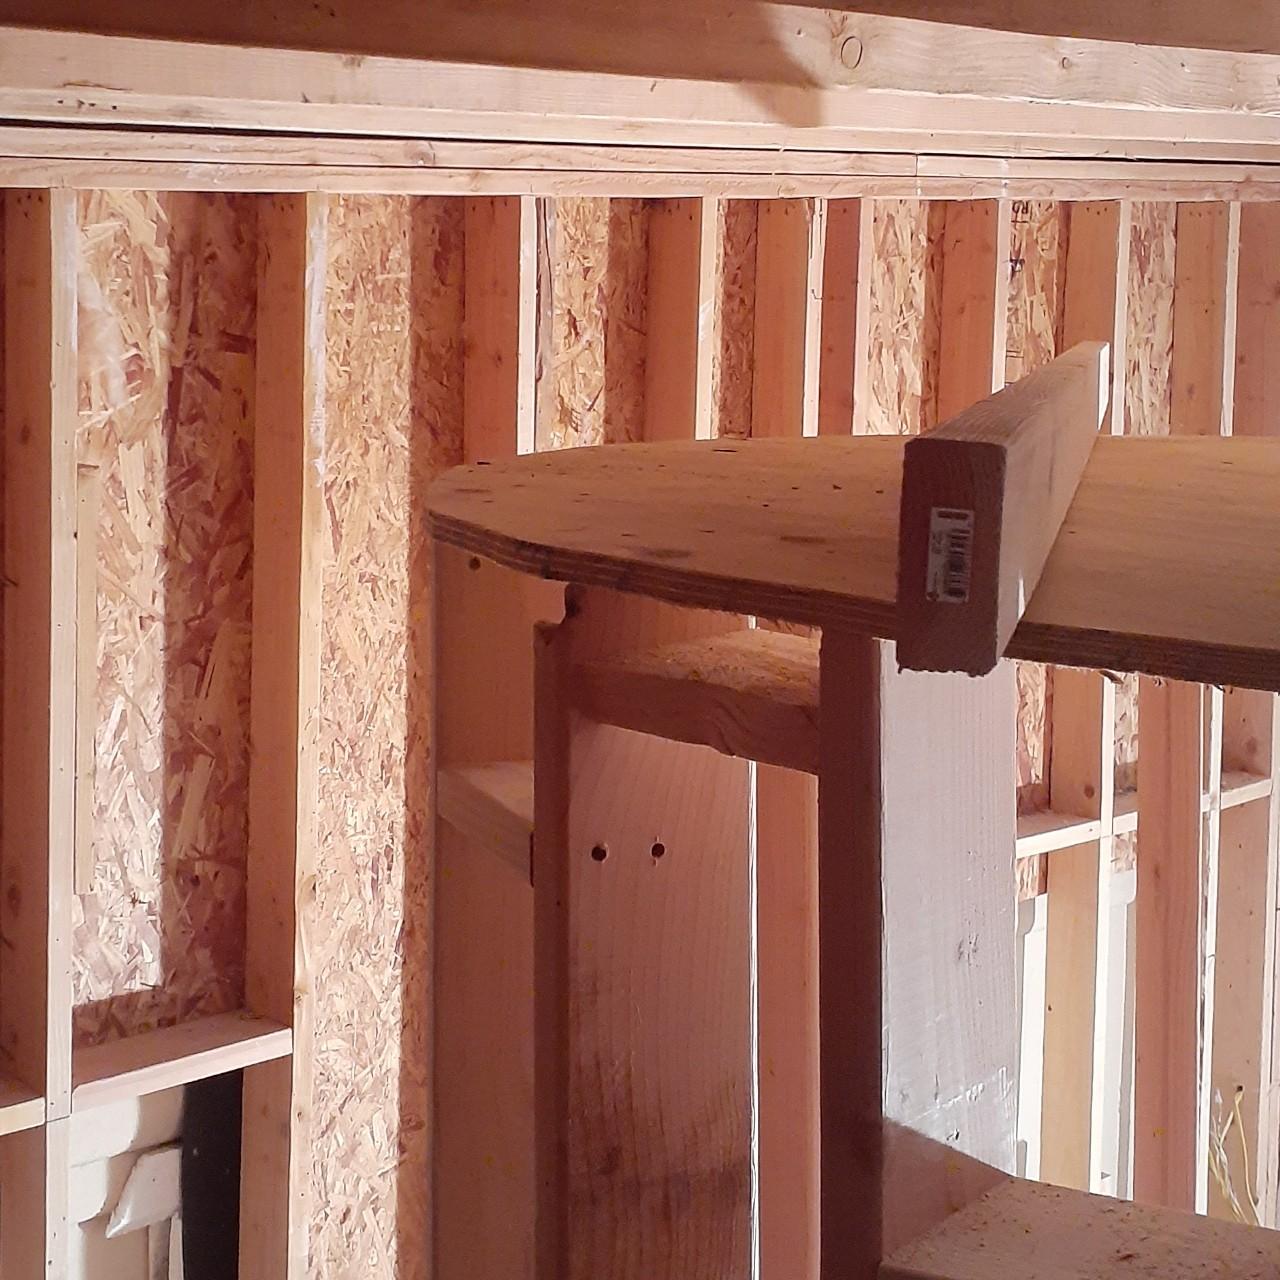 carpentry-wood-framing-second-floor-home-addition--framing-42